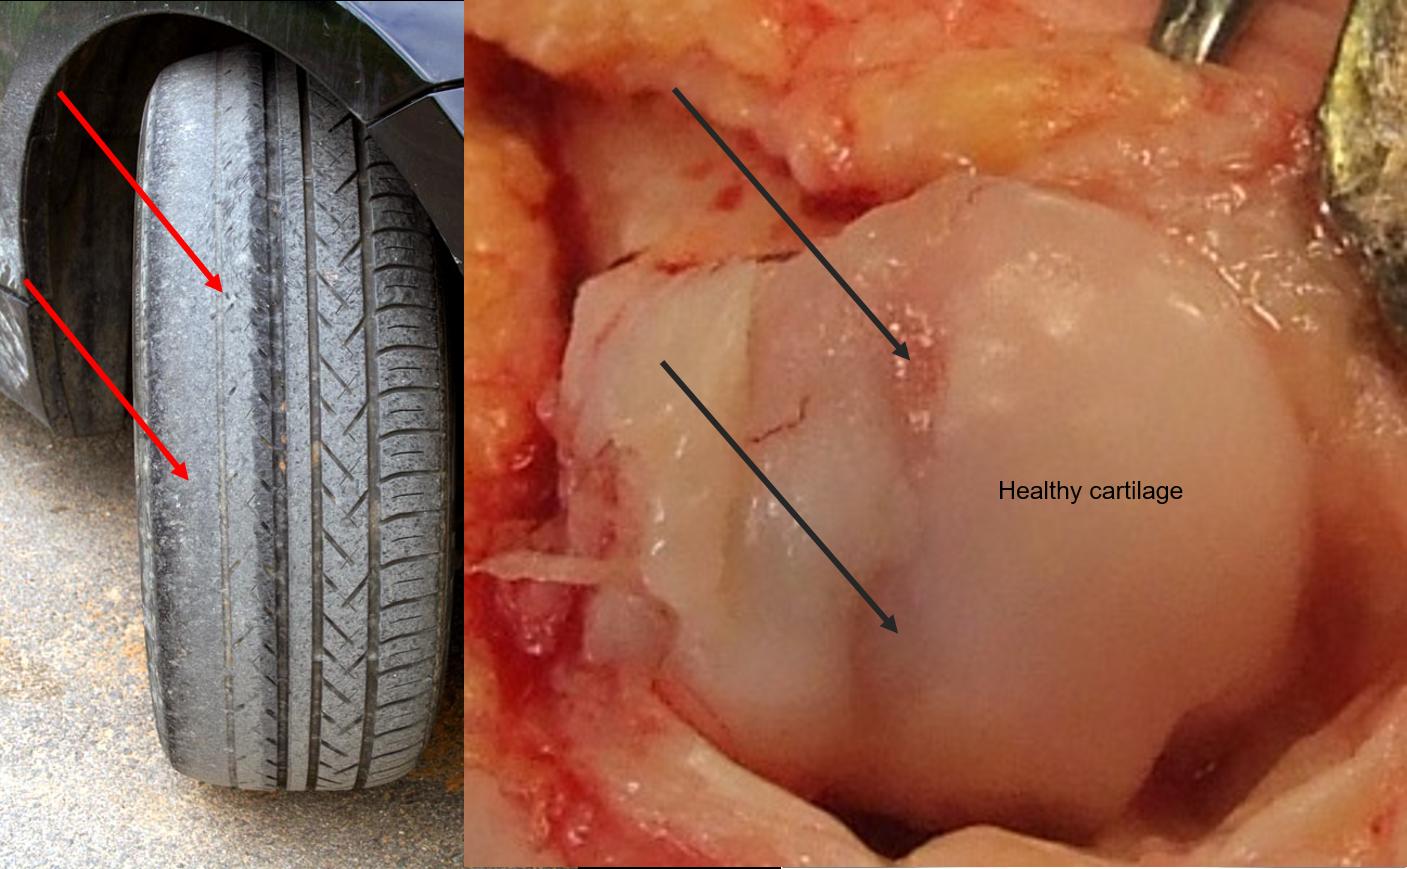 Bunions and big toe joint arthritis